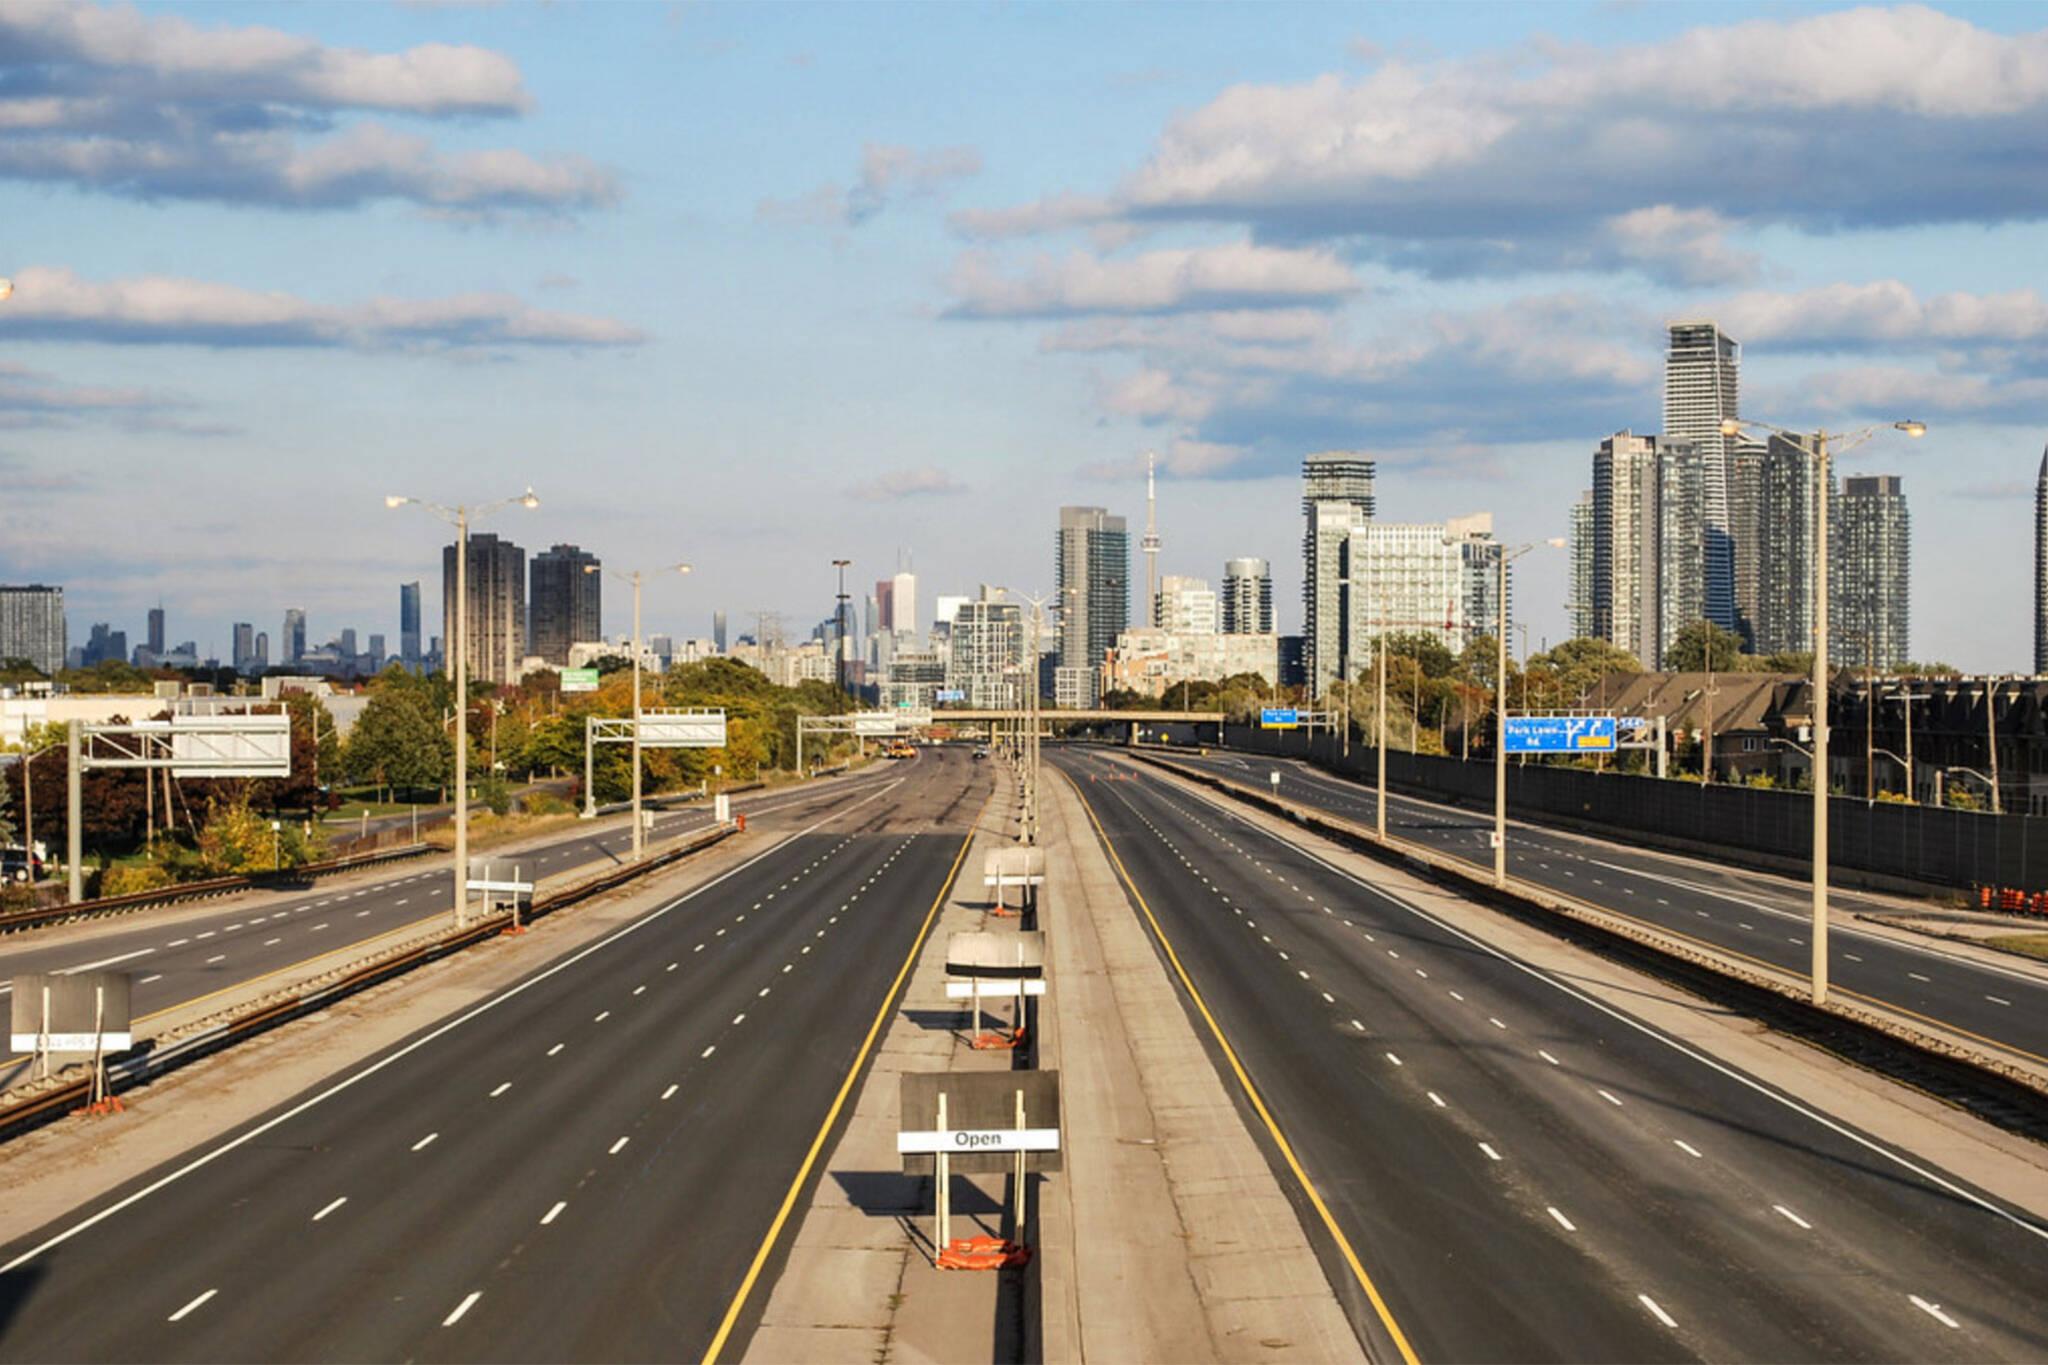 Gardiner Expressway